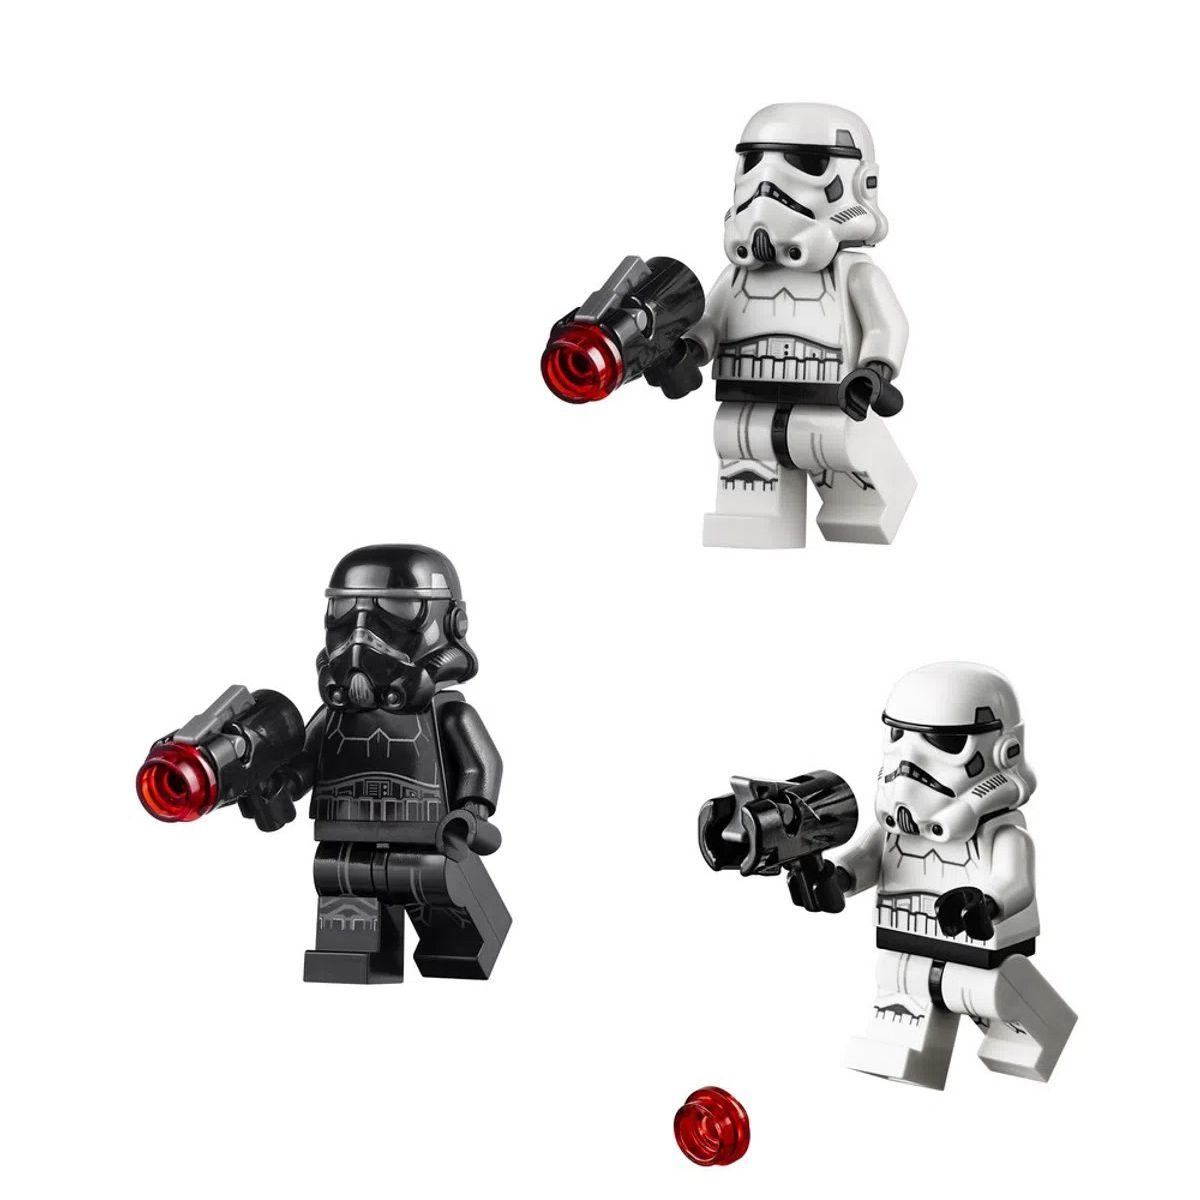 Lego - Star Wars - Dropship Imperial Ediçao de 20 anos - 75262